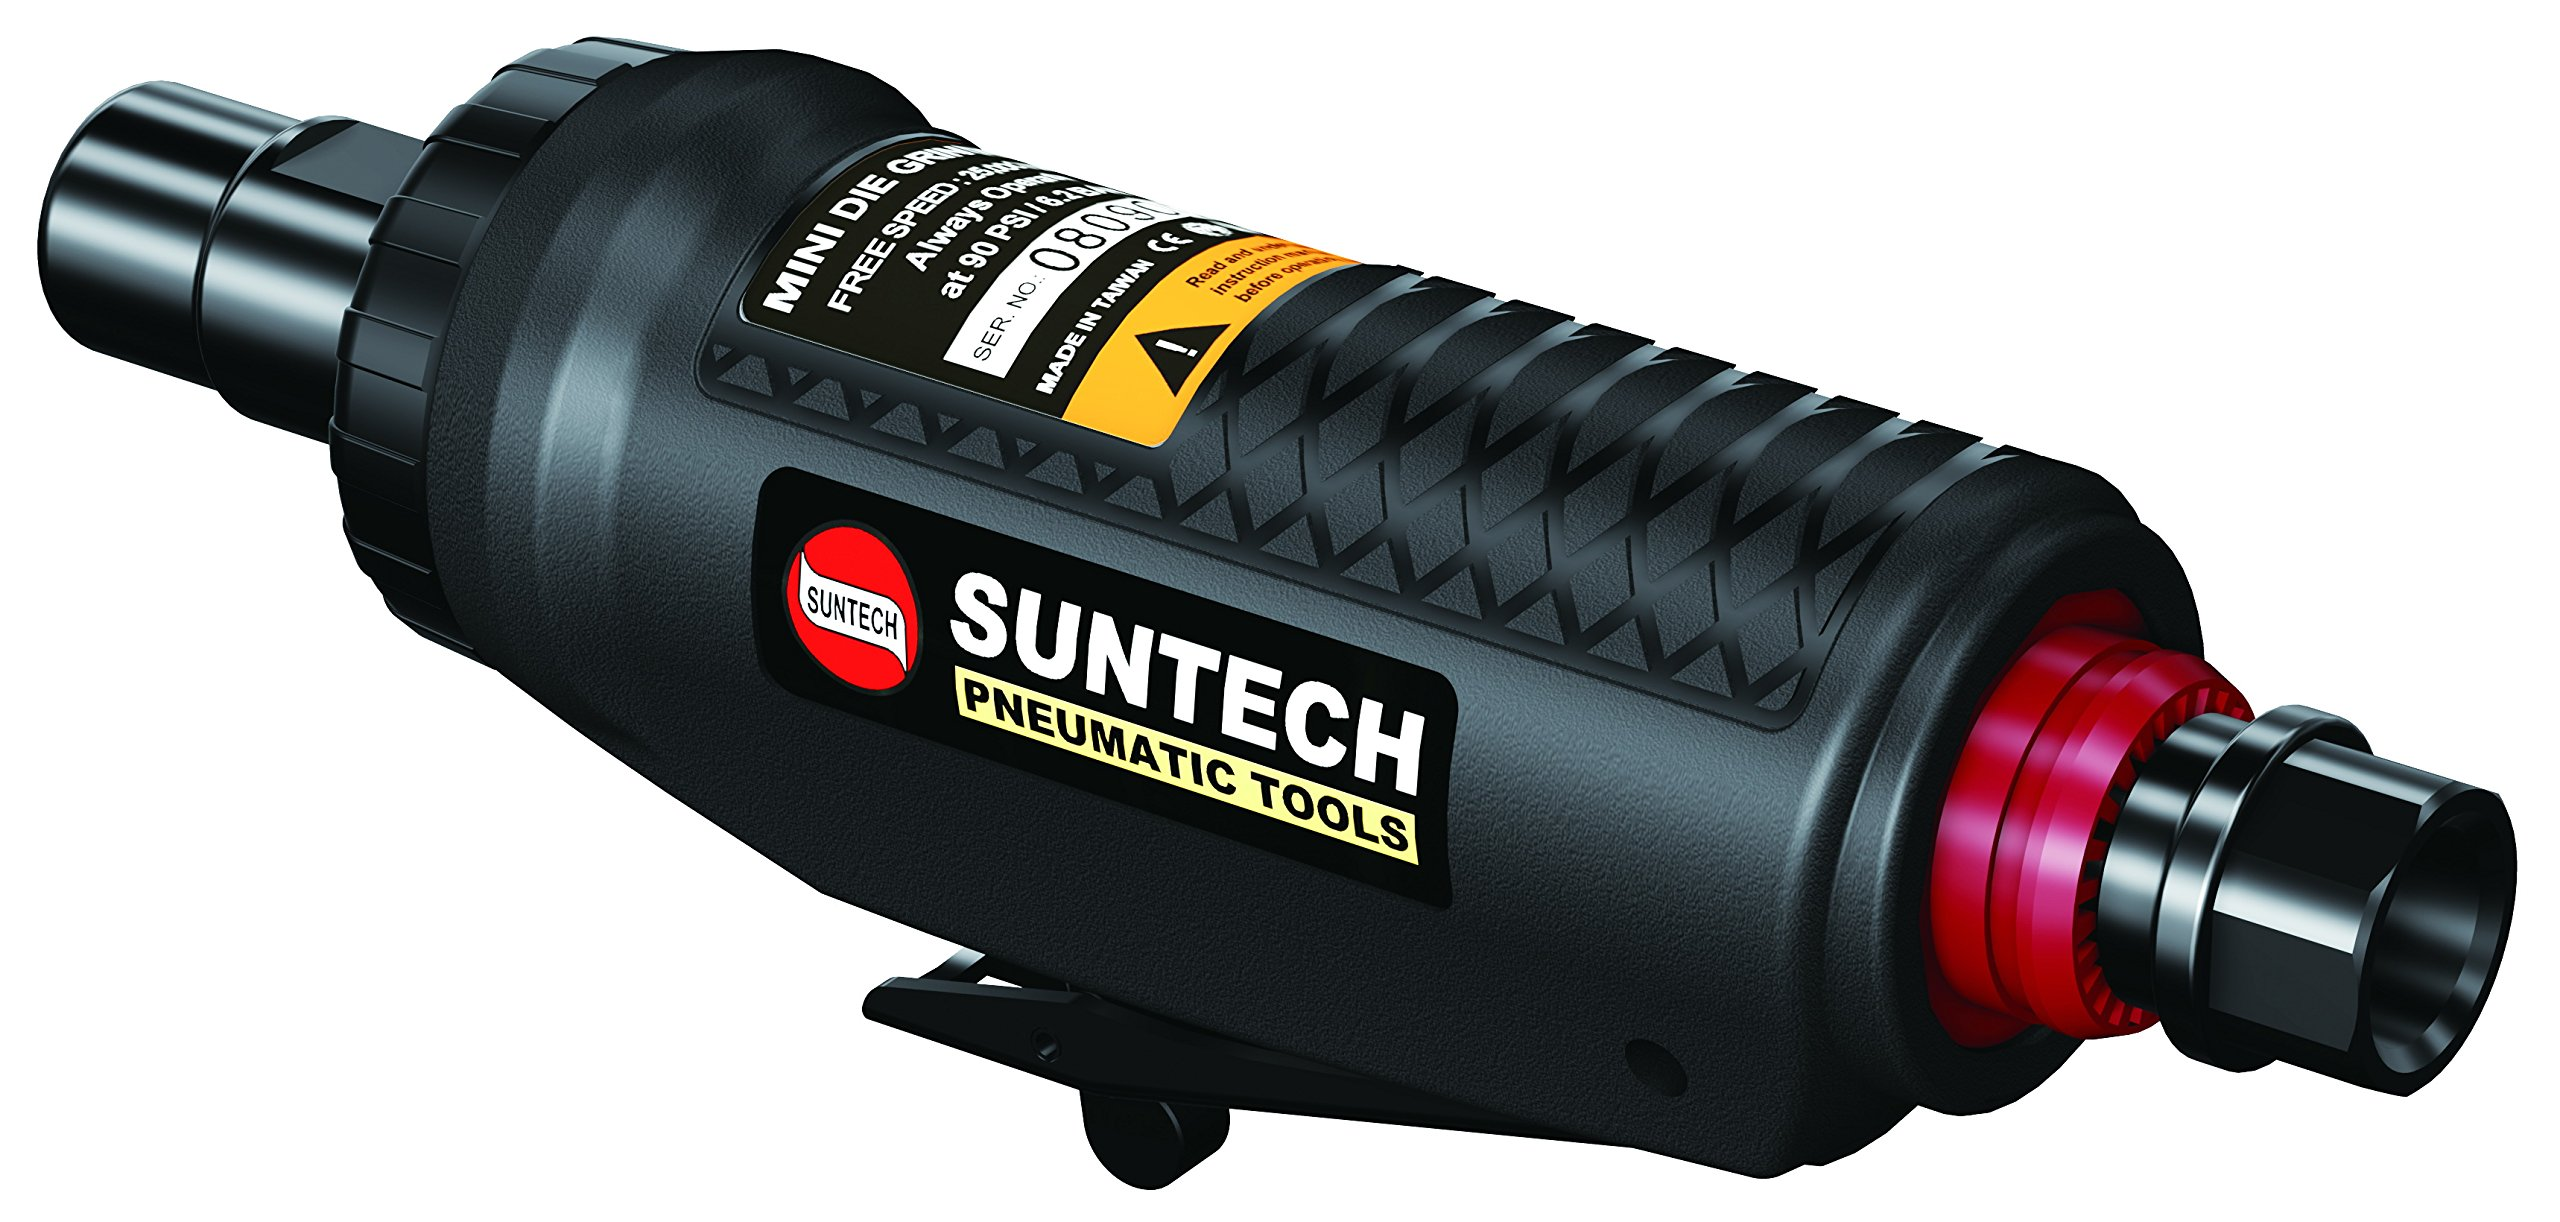 SUNTECH SM-53-5300 Sunmatch Power Die Grinders, Black